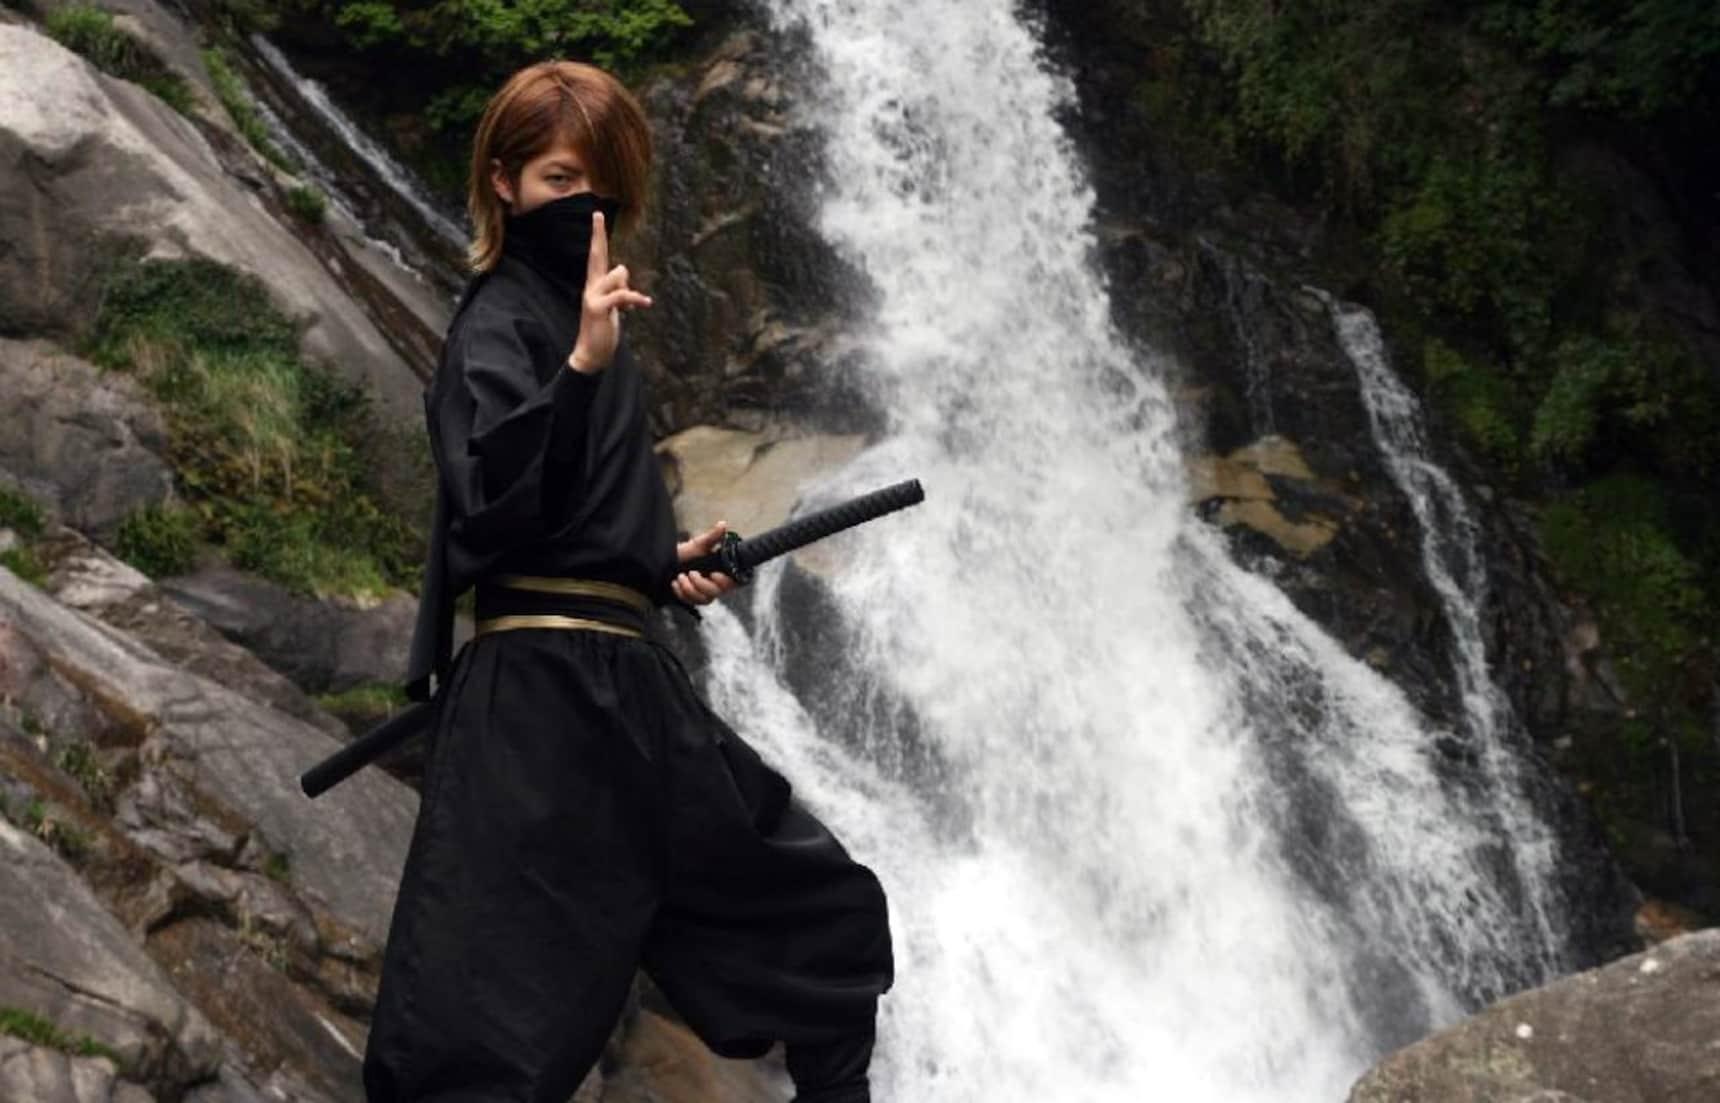 Sneak Back in Time to a Ninja Village